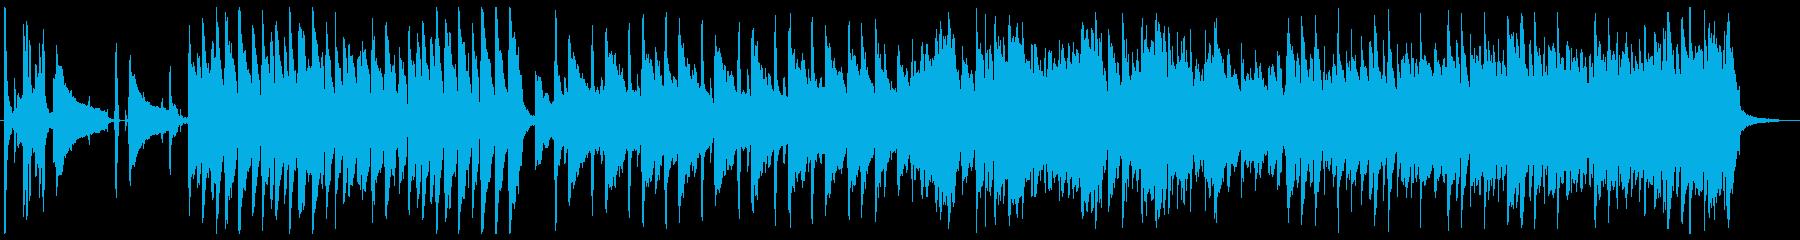 CM音楽 Jazz Funkの再生済みの波形